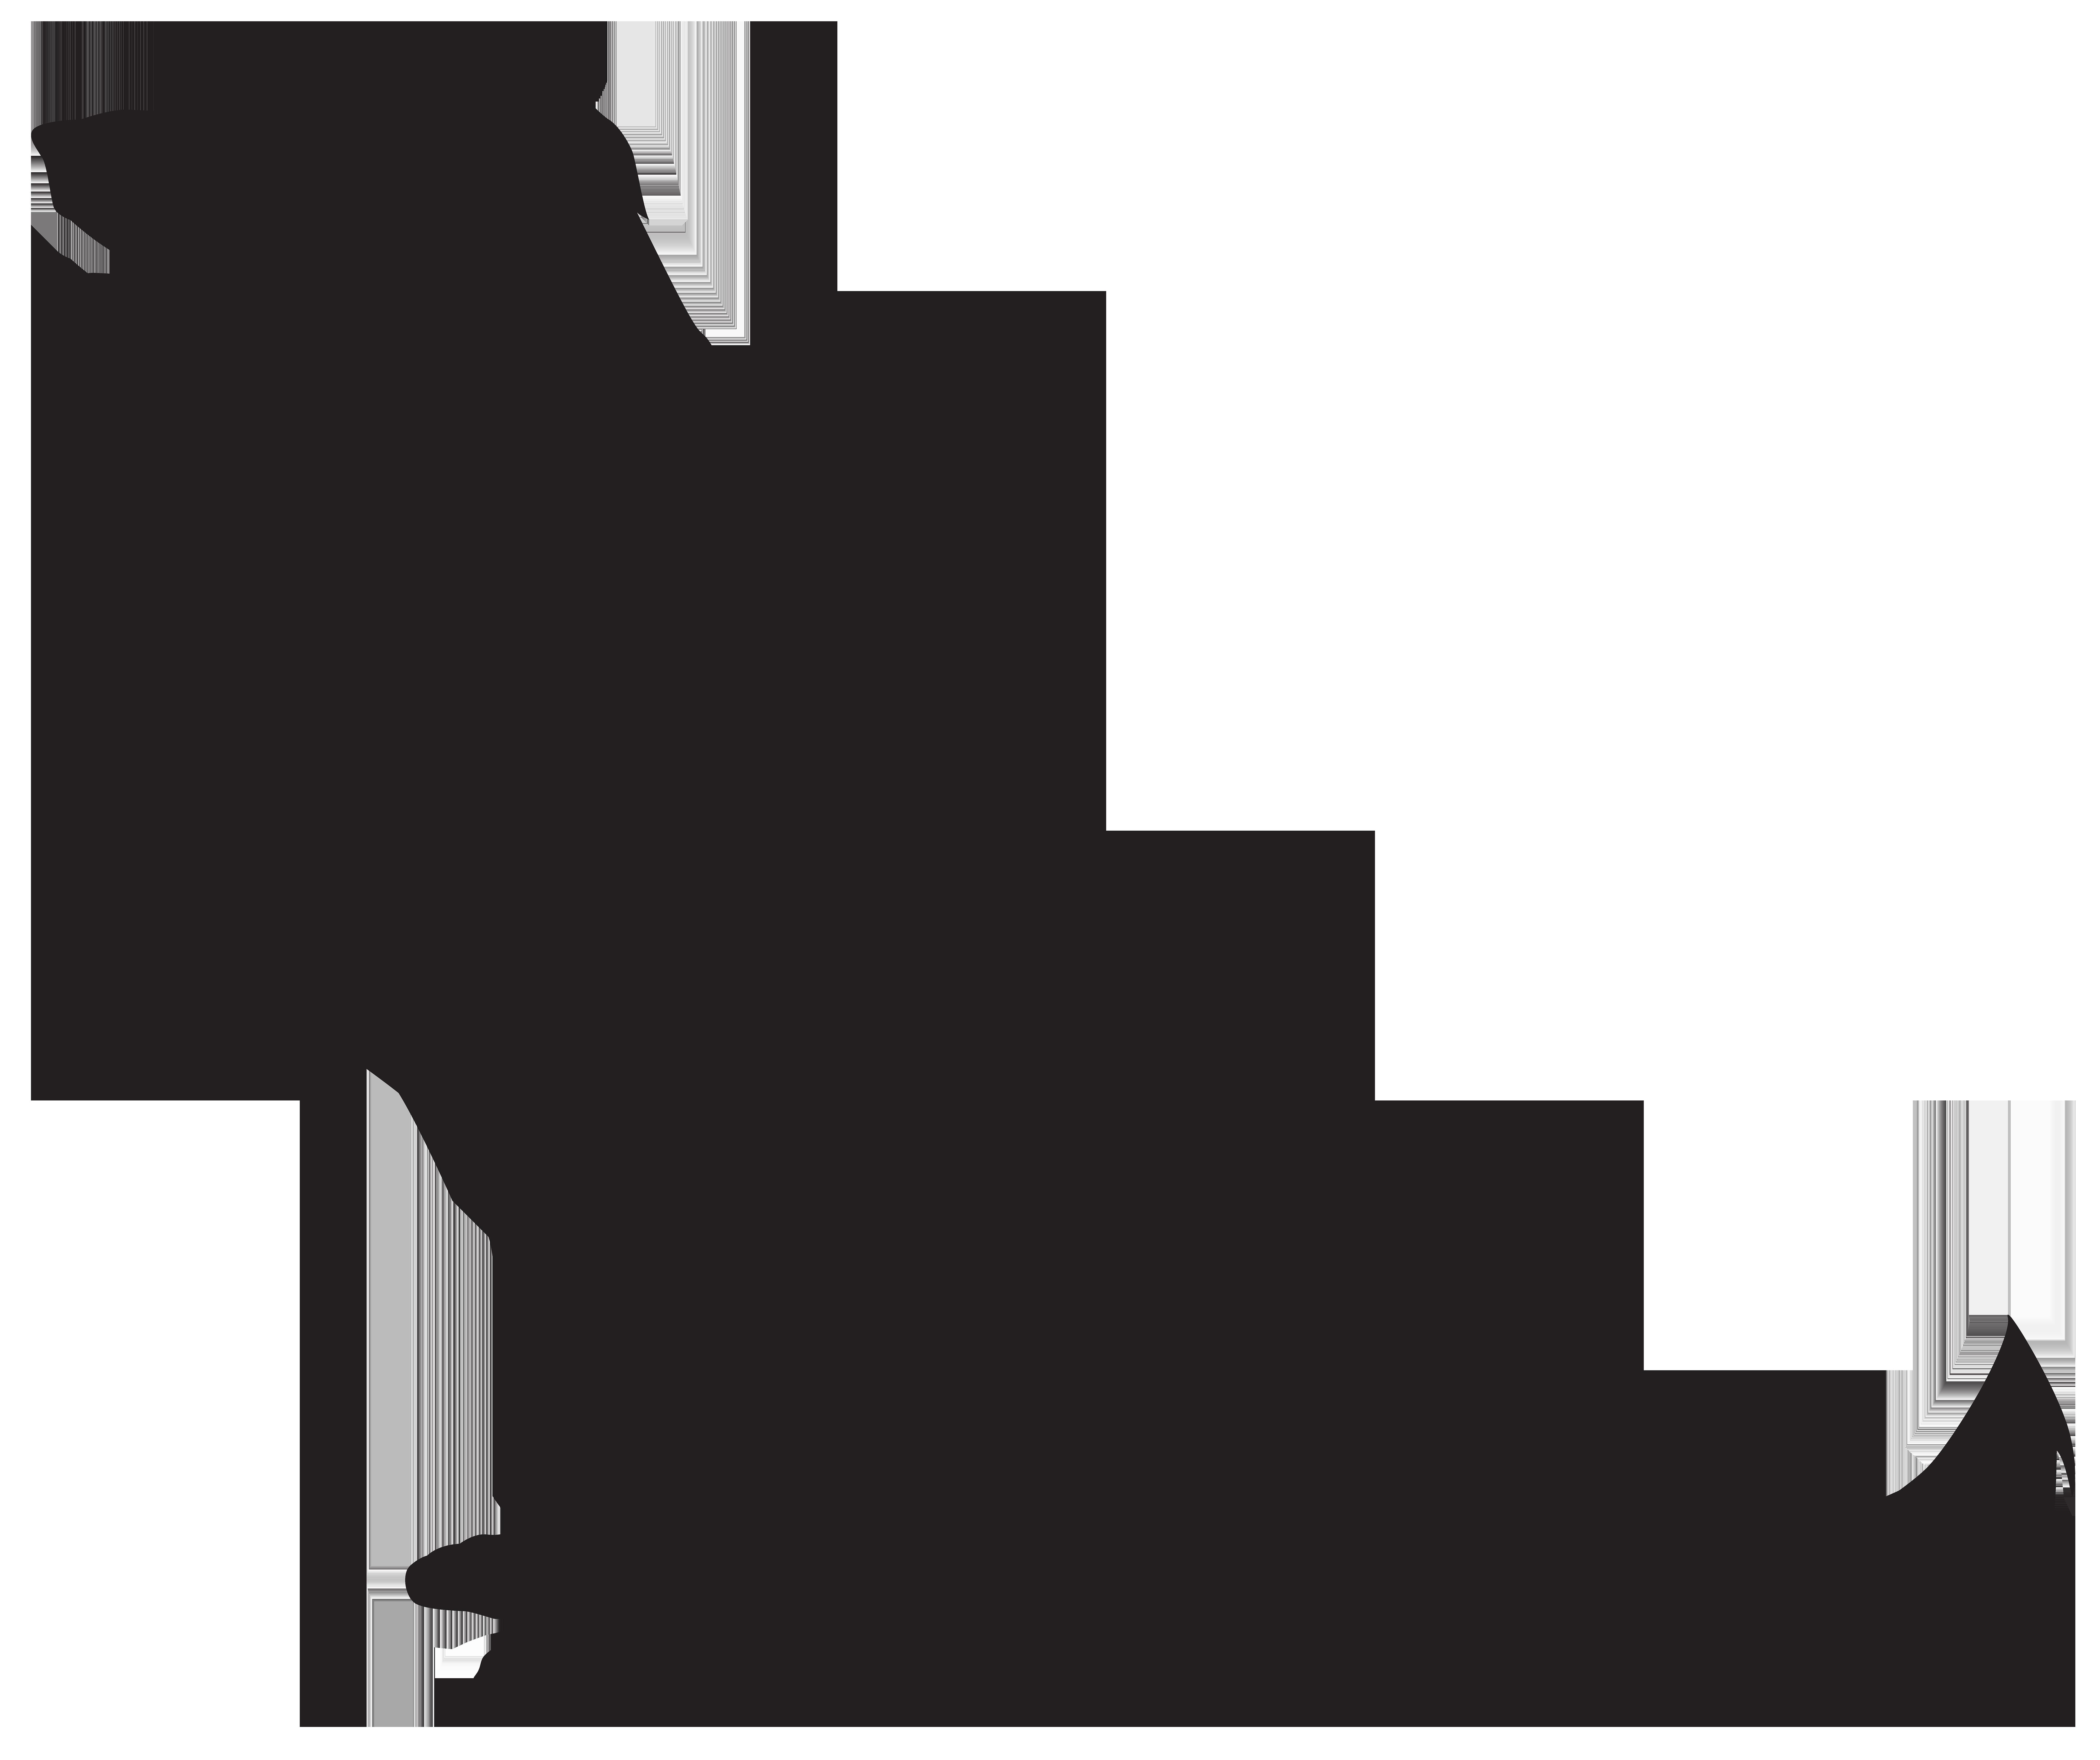 Free Dog Silhouette Clip Art.